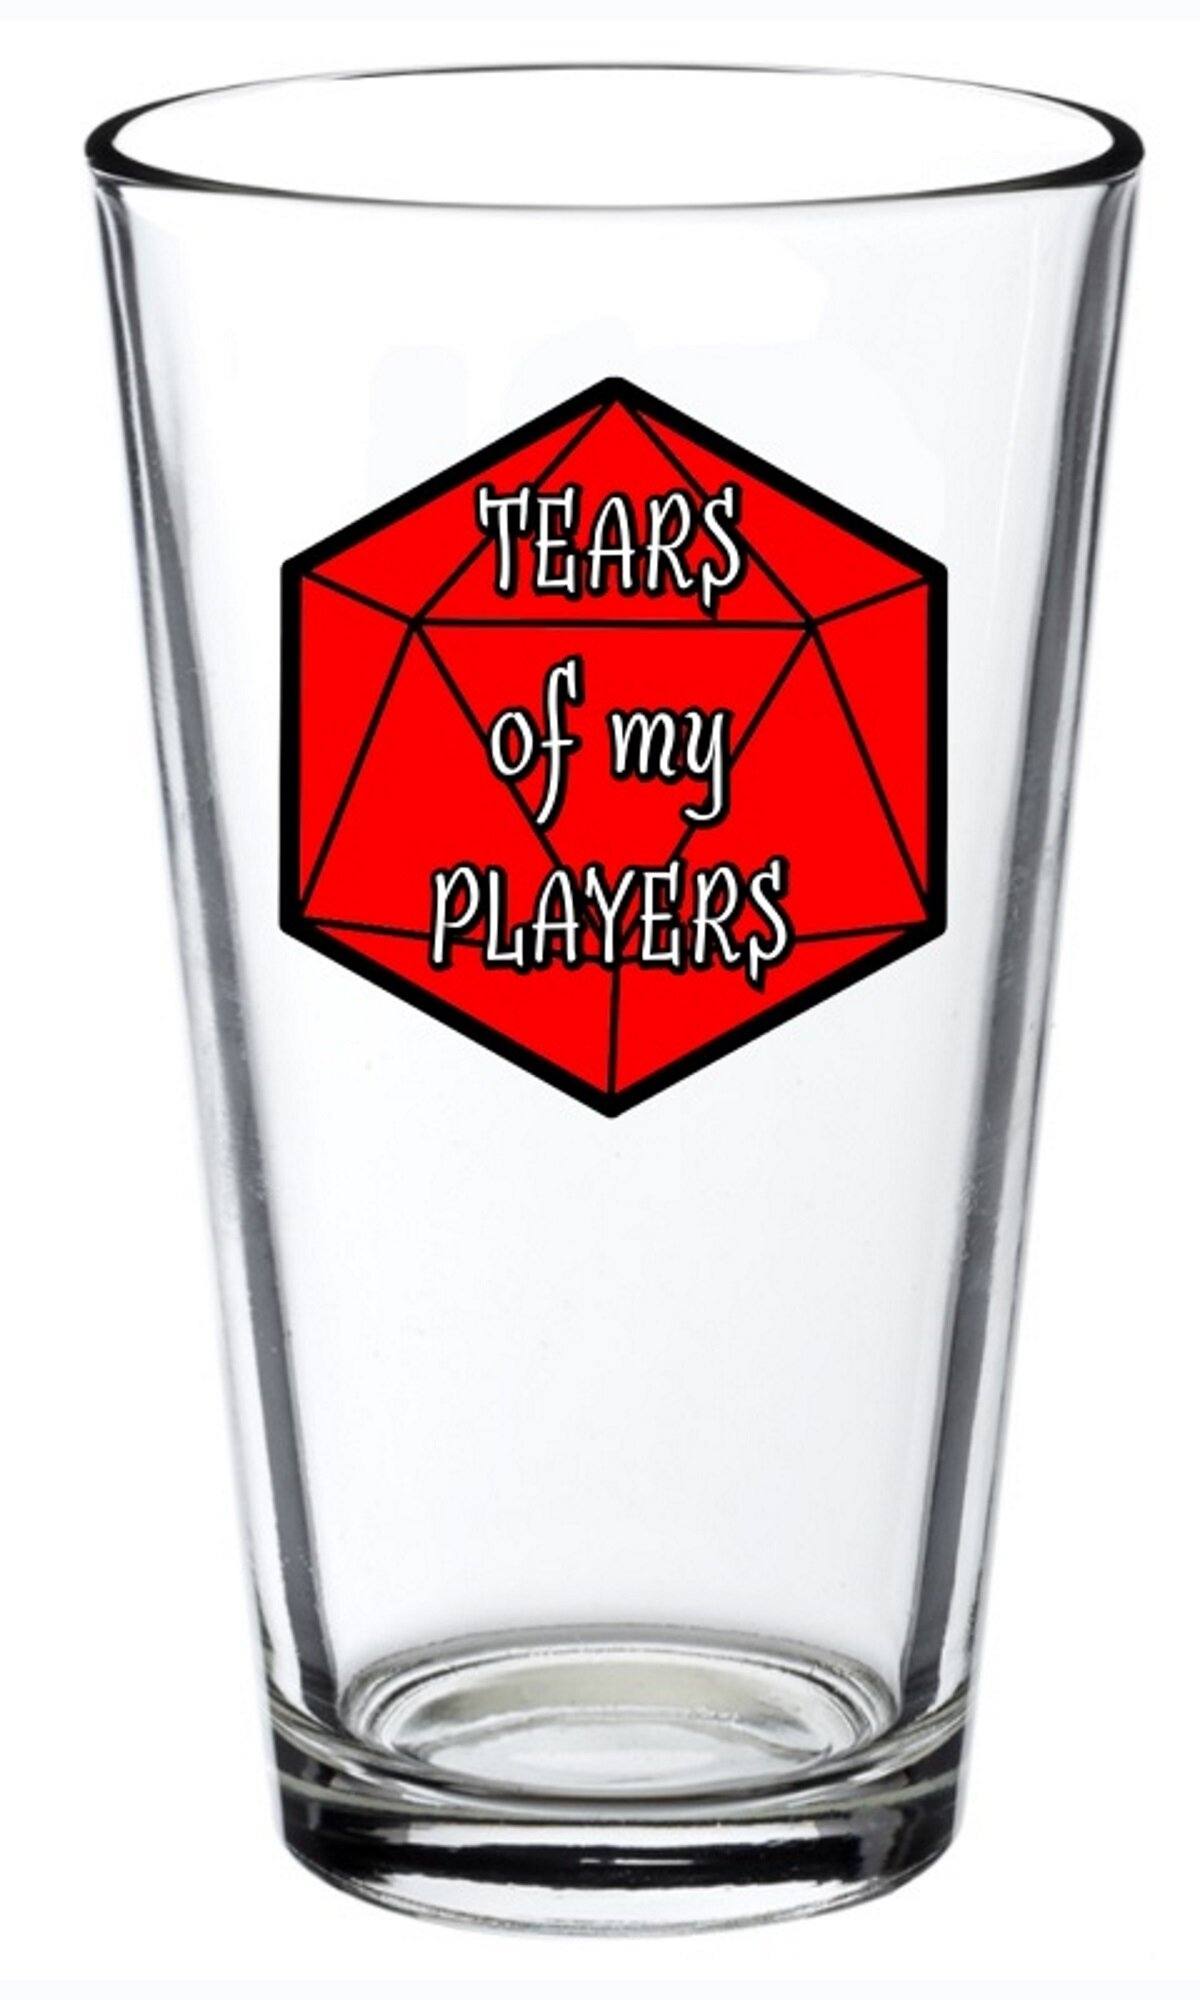 Tears of my Players